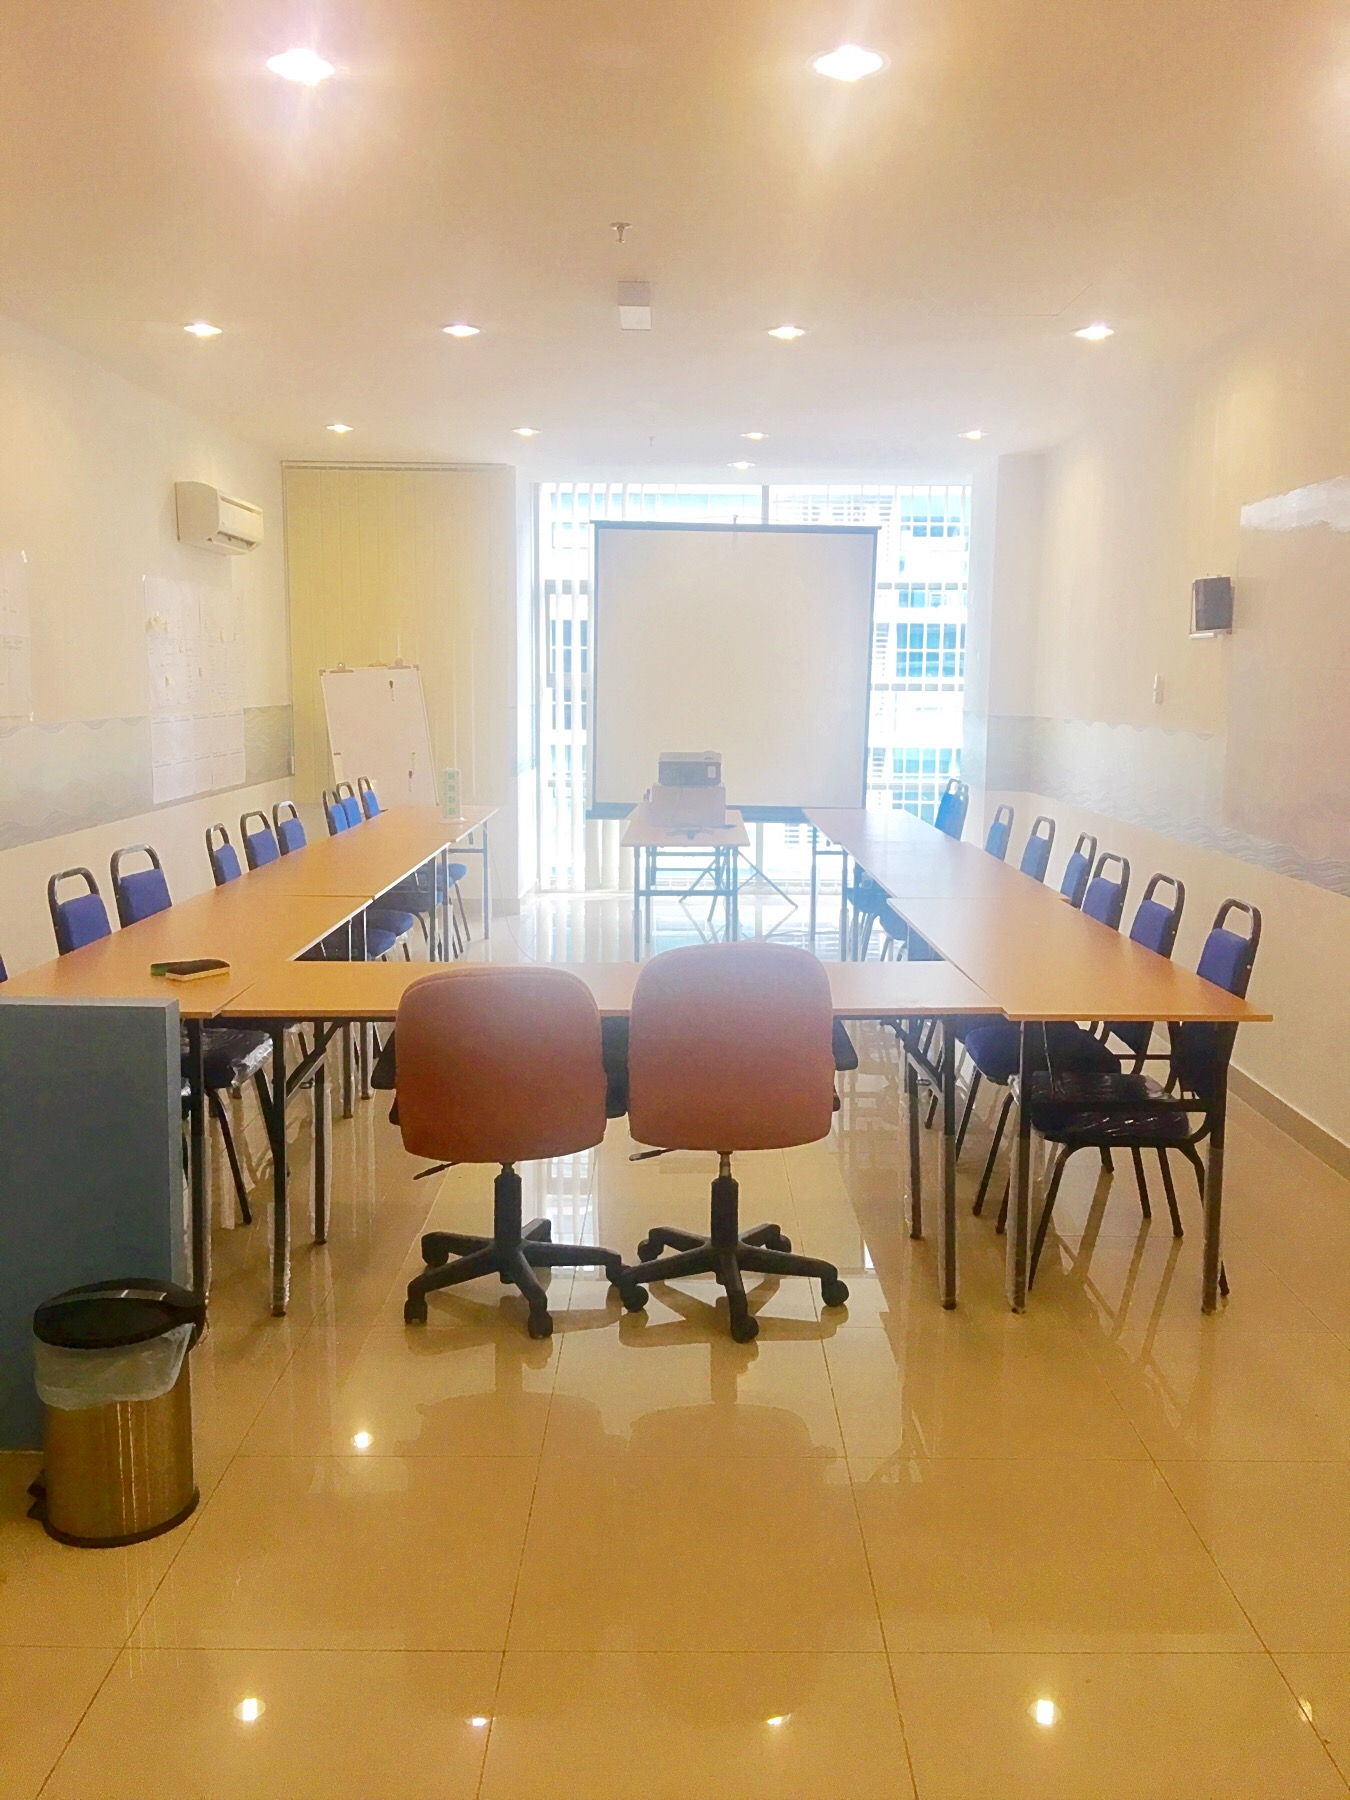 iBusinessSpace @ Subang Jaya, Subang Jaya